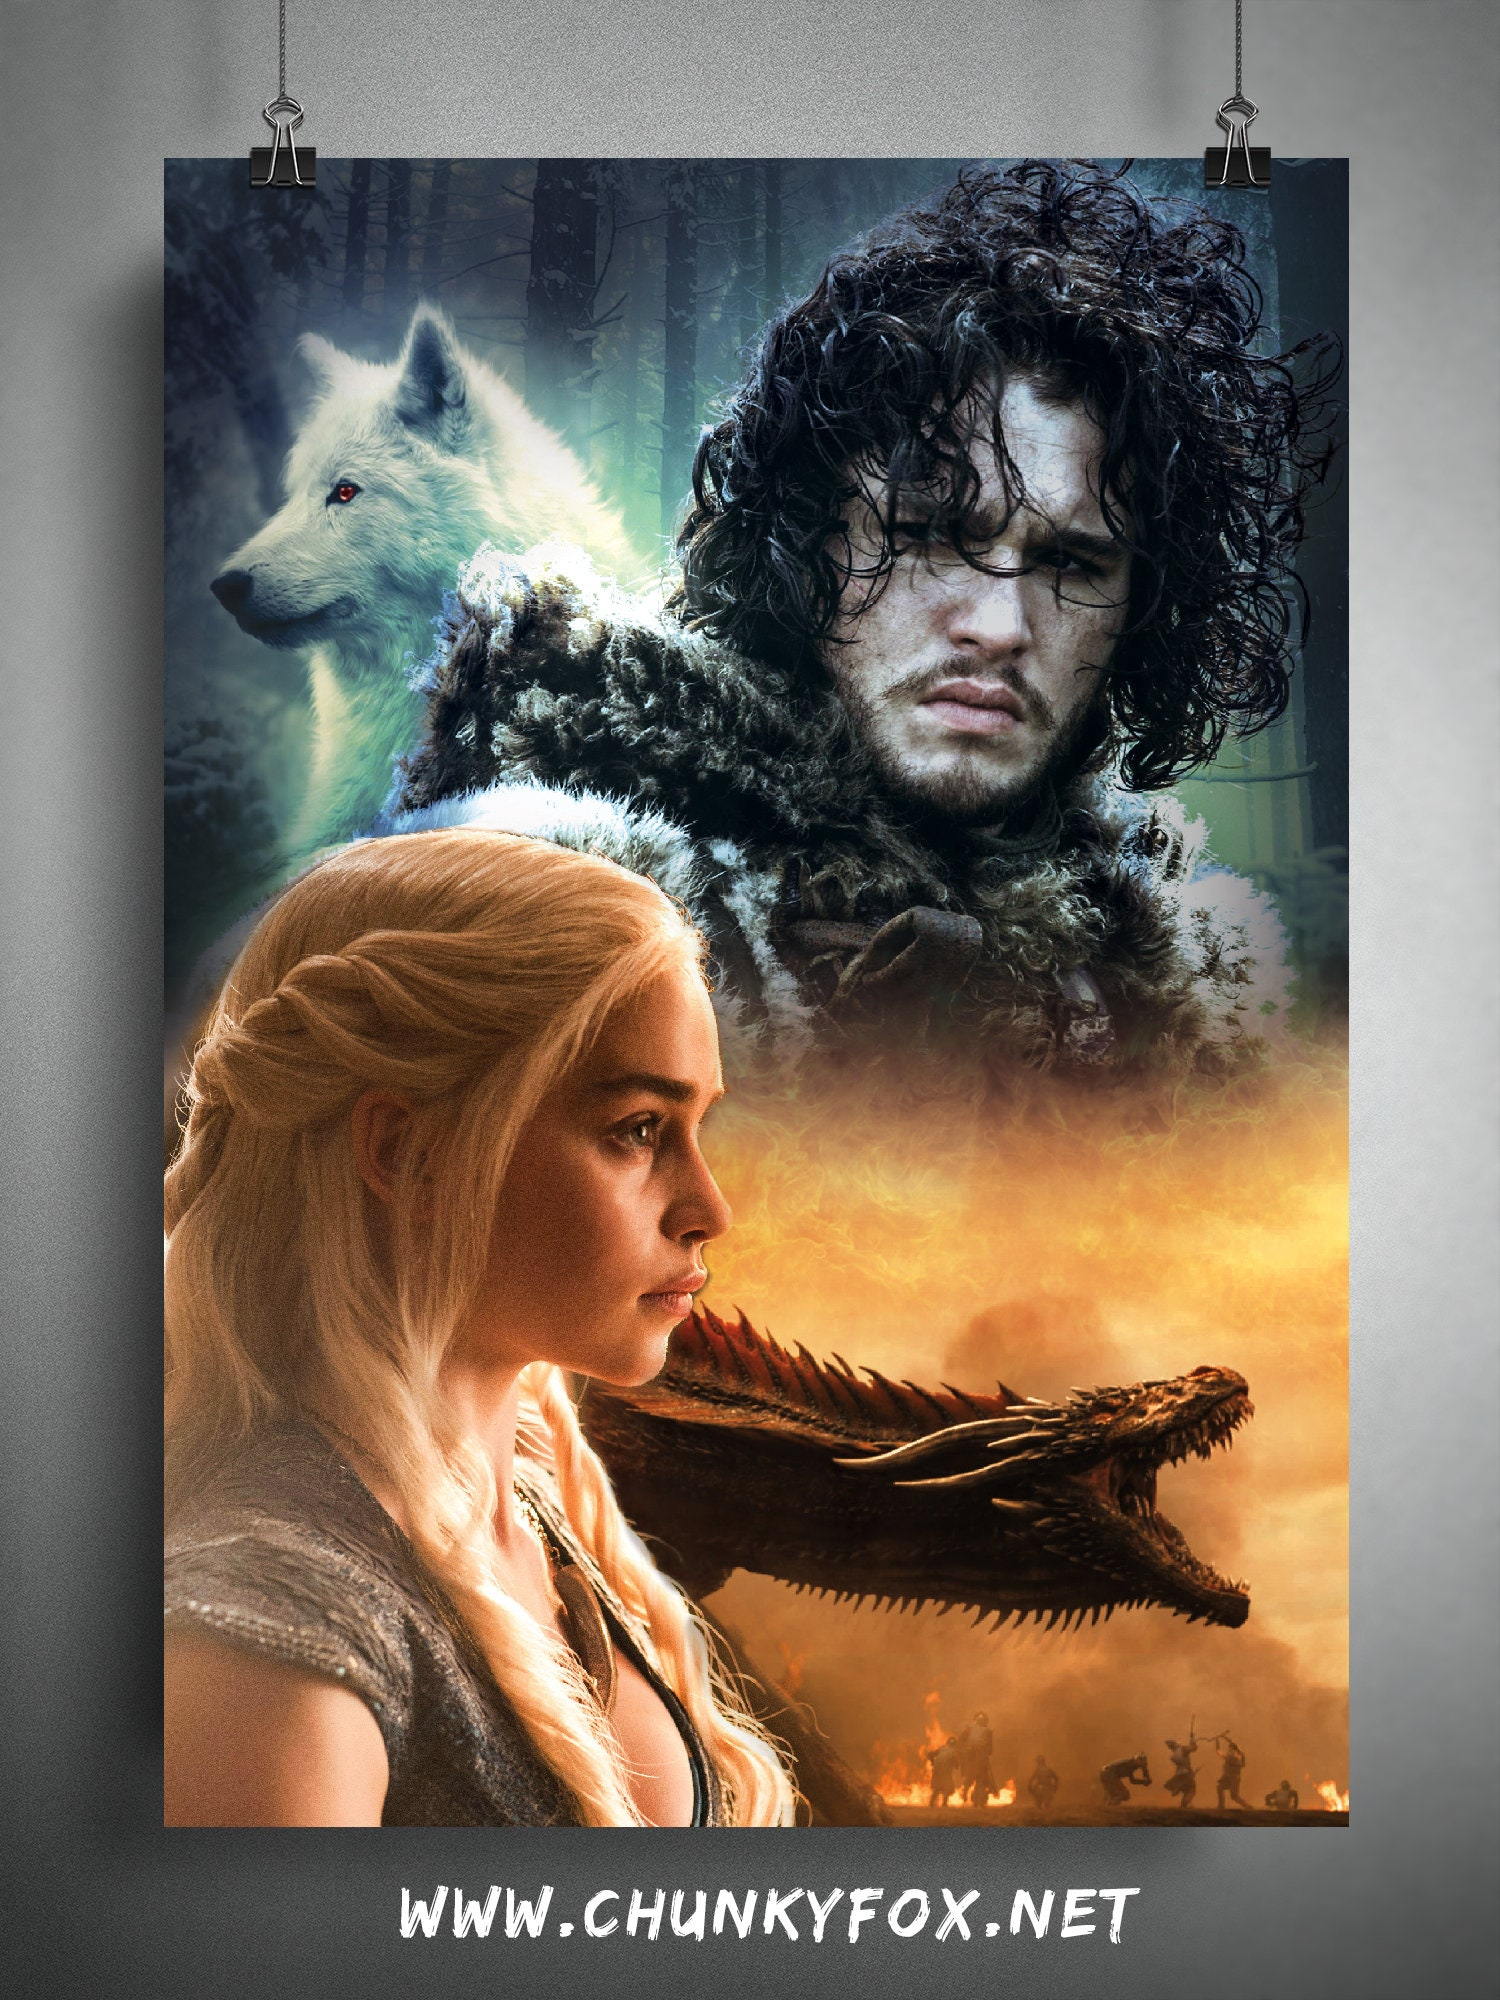 GAME OF THRONES TV Show PHOTO Print POSTER Daenerys Targaryen Emilia Clarke 023